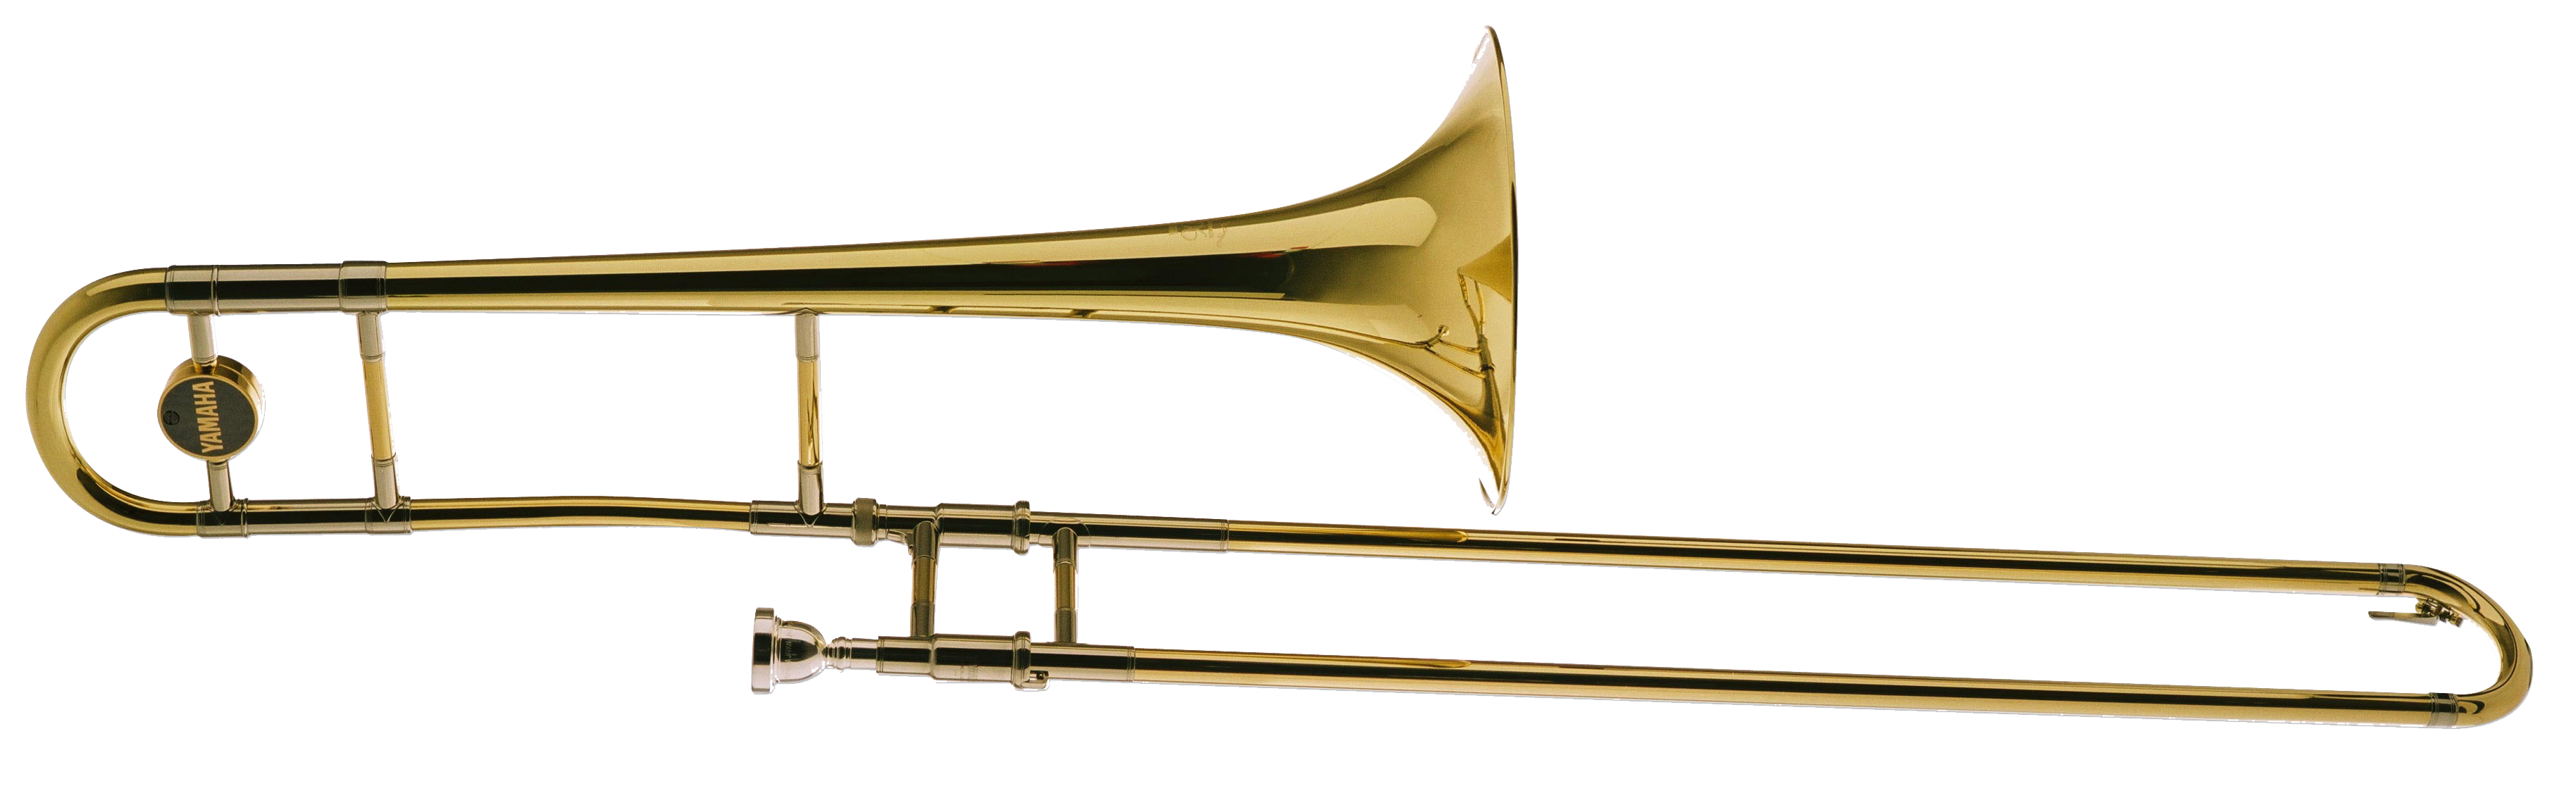 Trombone PNG - Trombone PNG